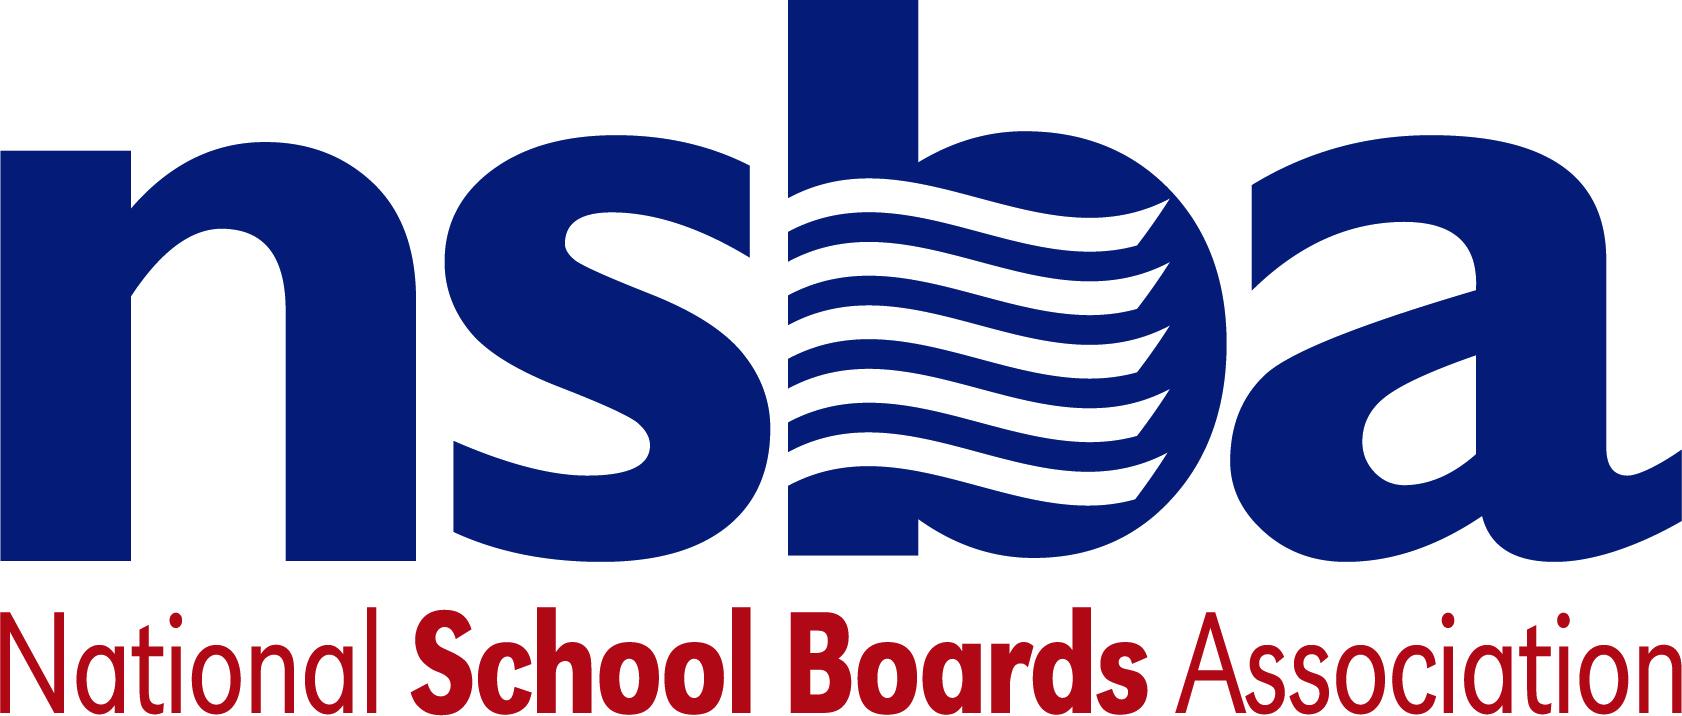 2018_NSBA Logo_updated